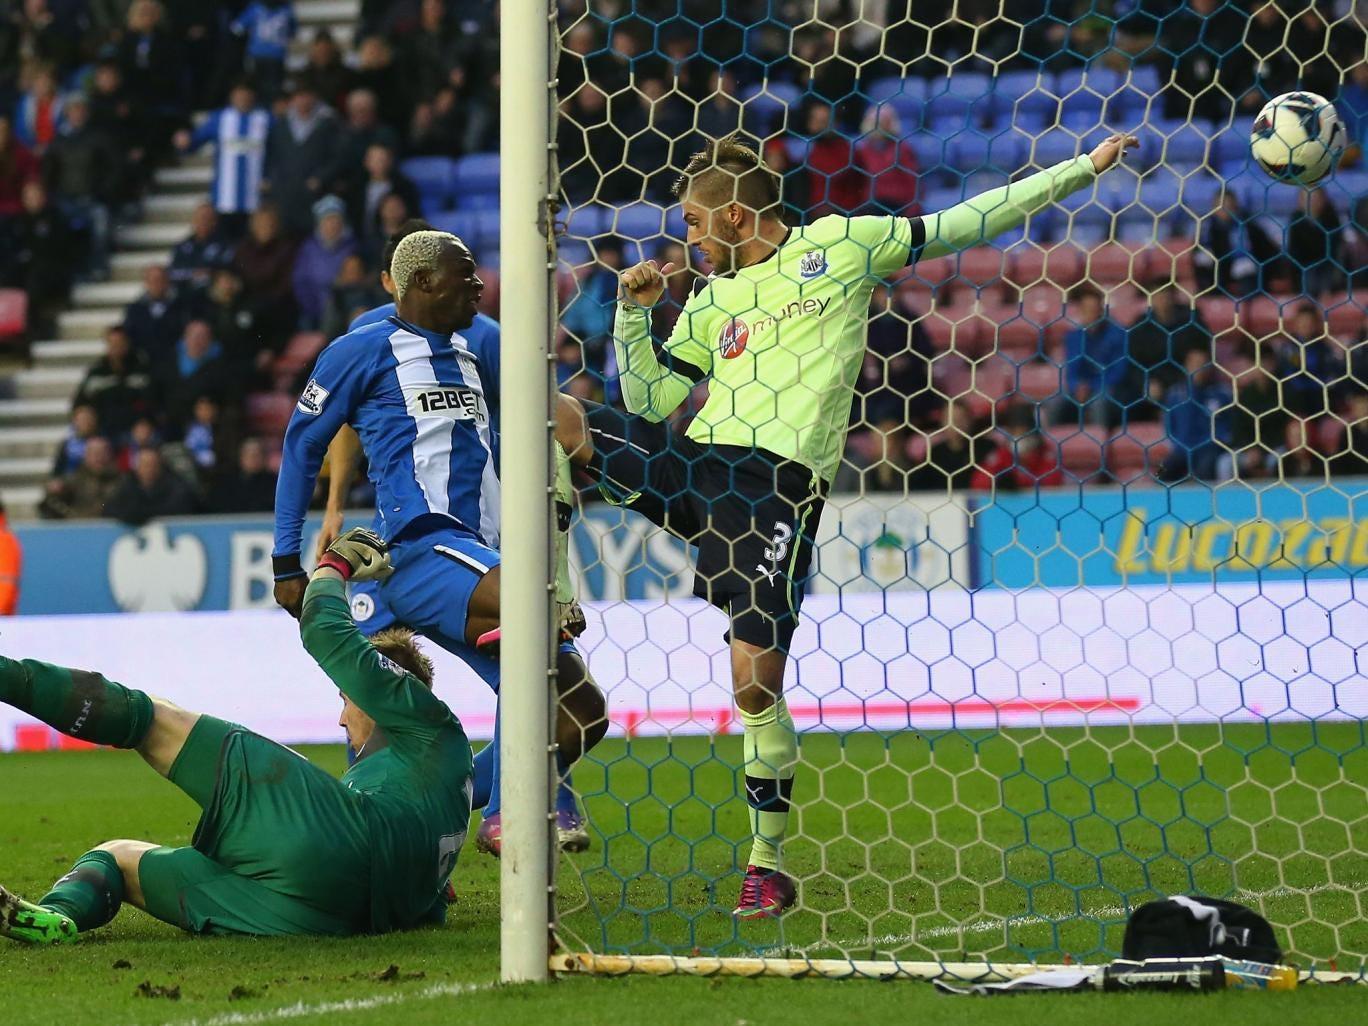 Arouna Kone of Wigan Athletic scores the winning goal